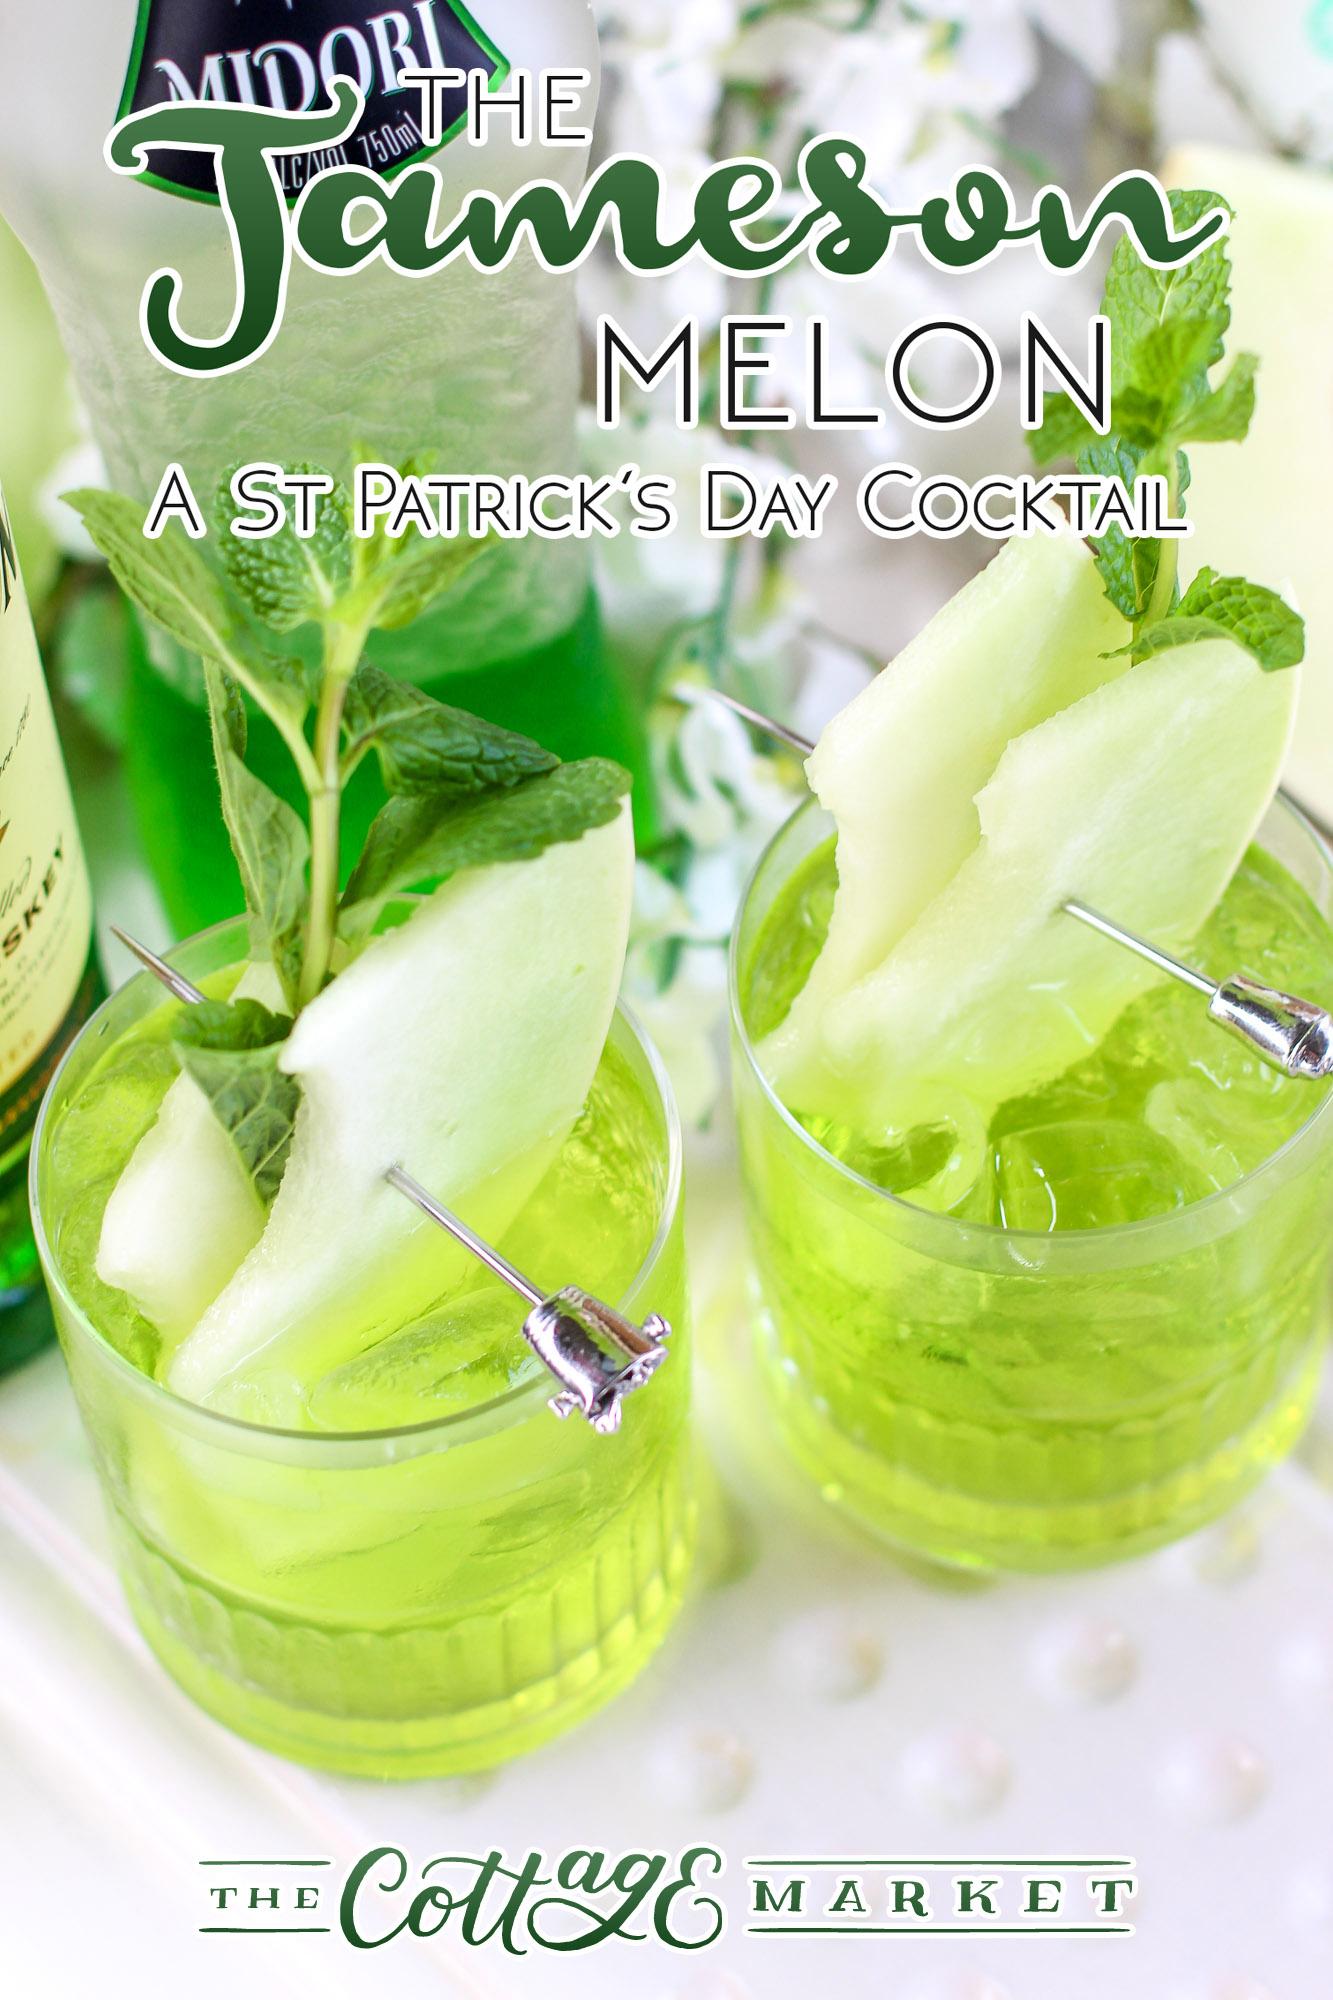 The Jameson Melon A St Patricks Day Cocktail The Cottage Market